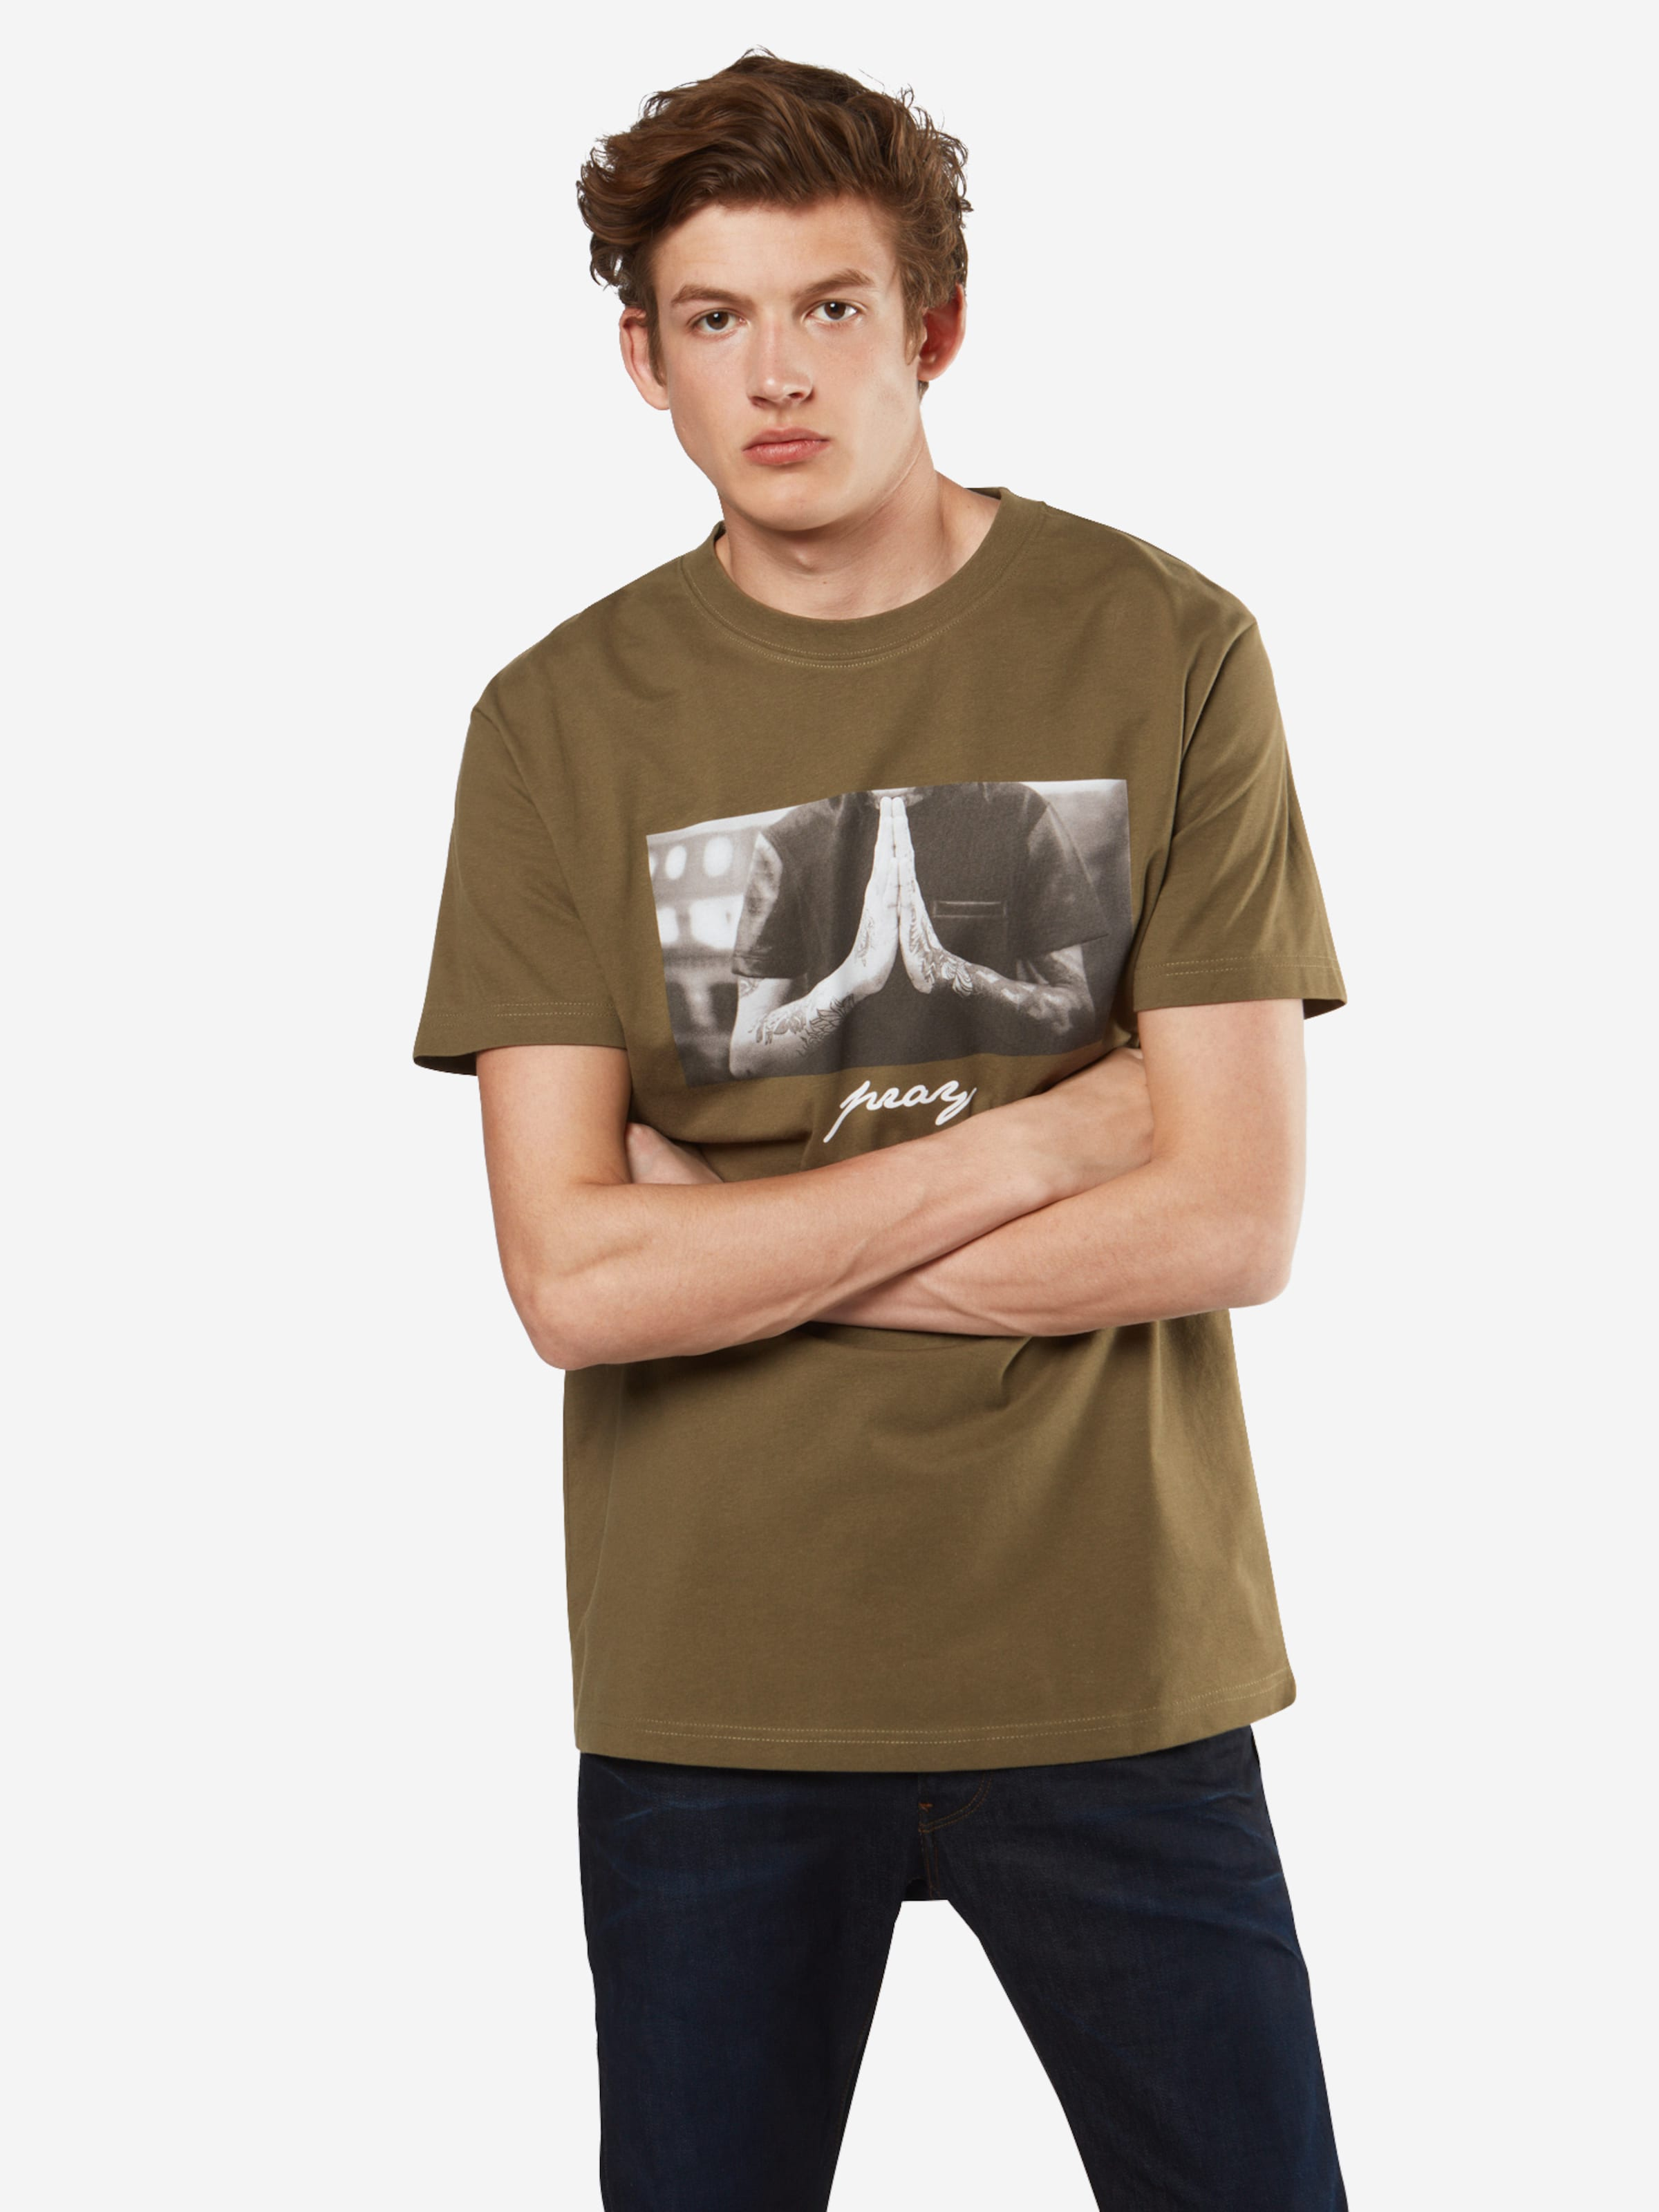 shirt In Tee GrauOliv T 'pray Black' Mister JcKlTF1